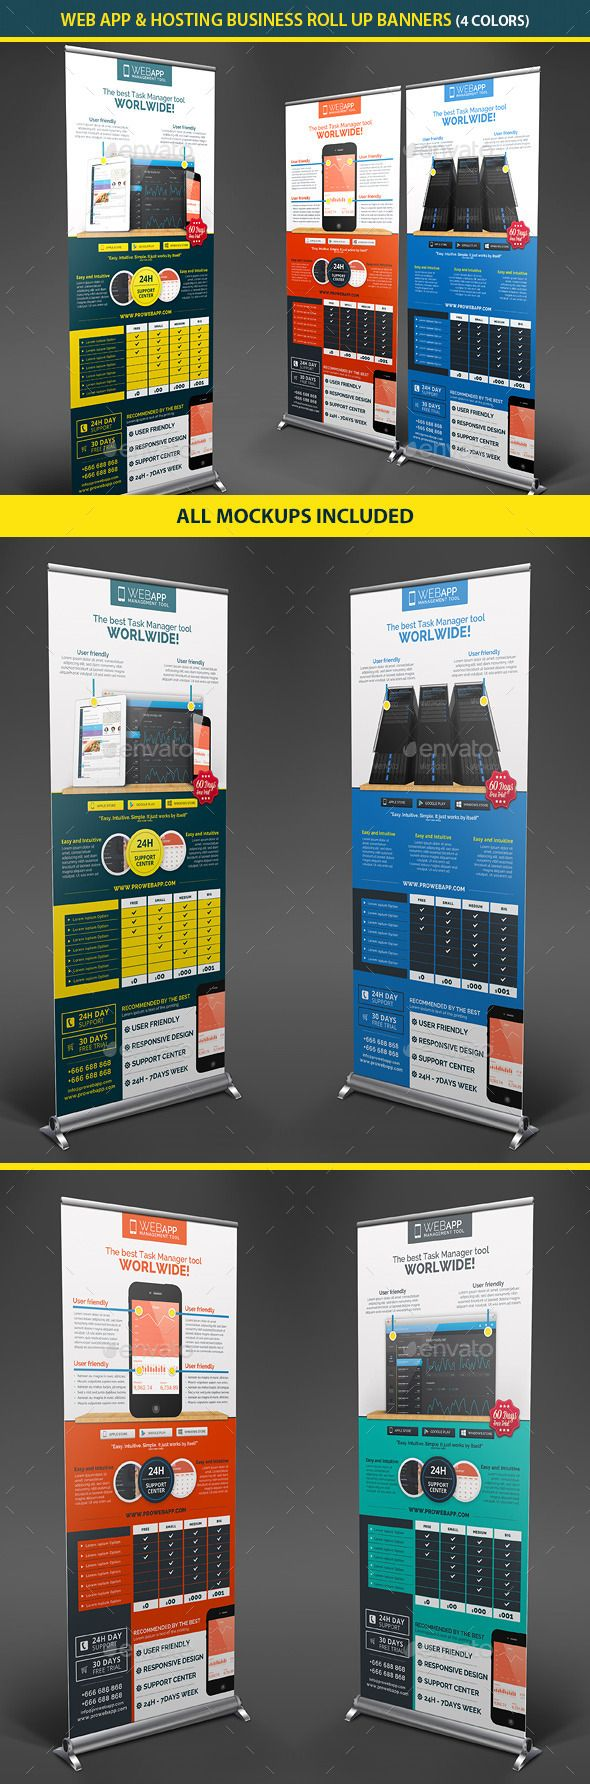 Web App Tech & Hosting Roll Up Banners — Photoshop PSD #ios #responsive • Av...